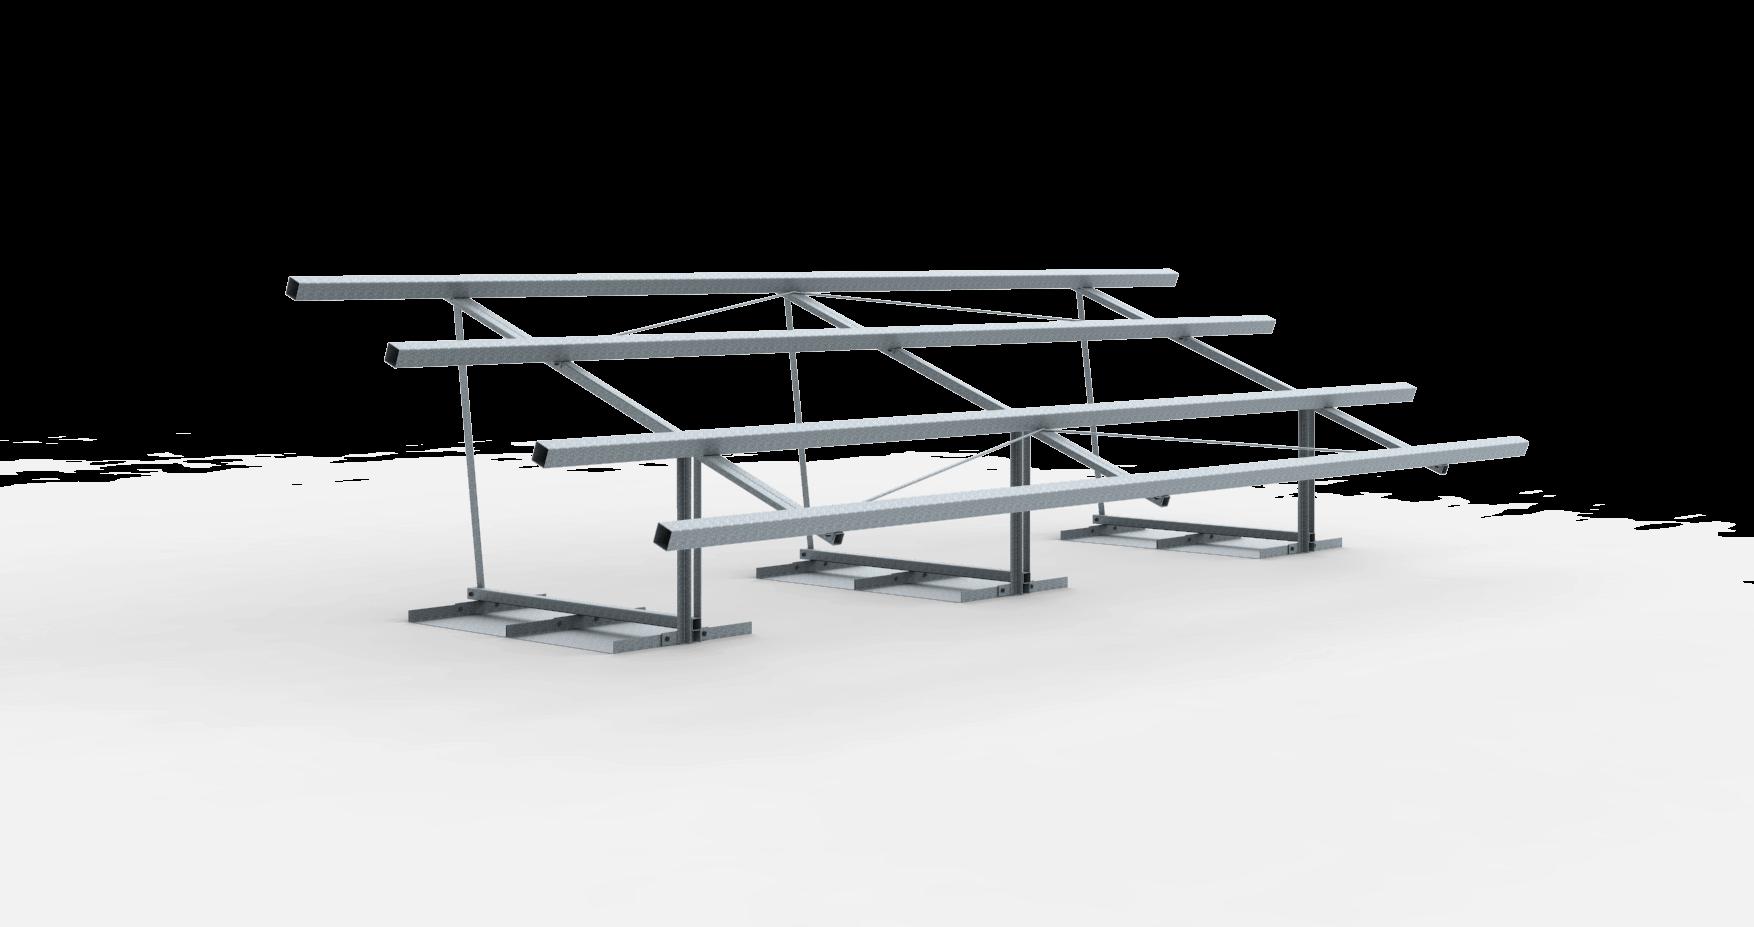 Frame vrije veldopstelling 12 zonnepanelen